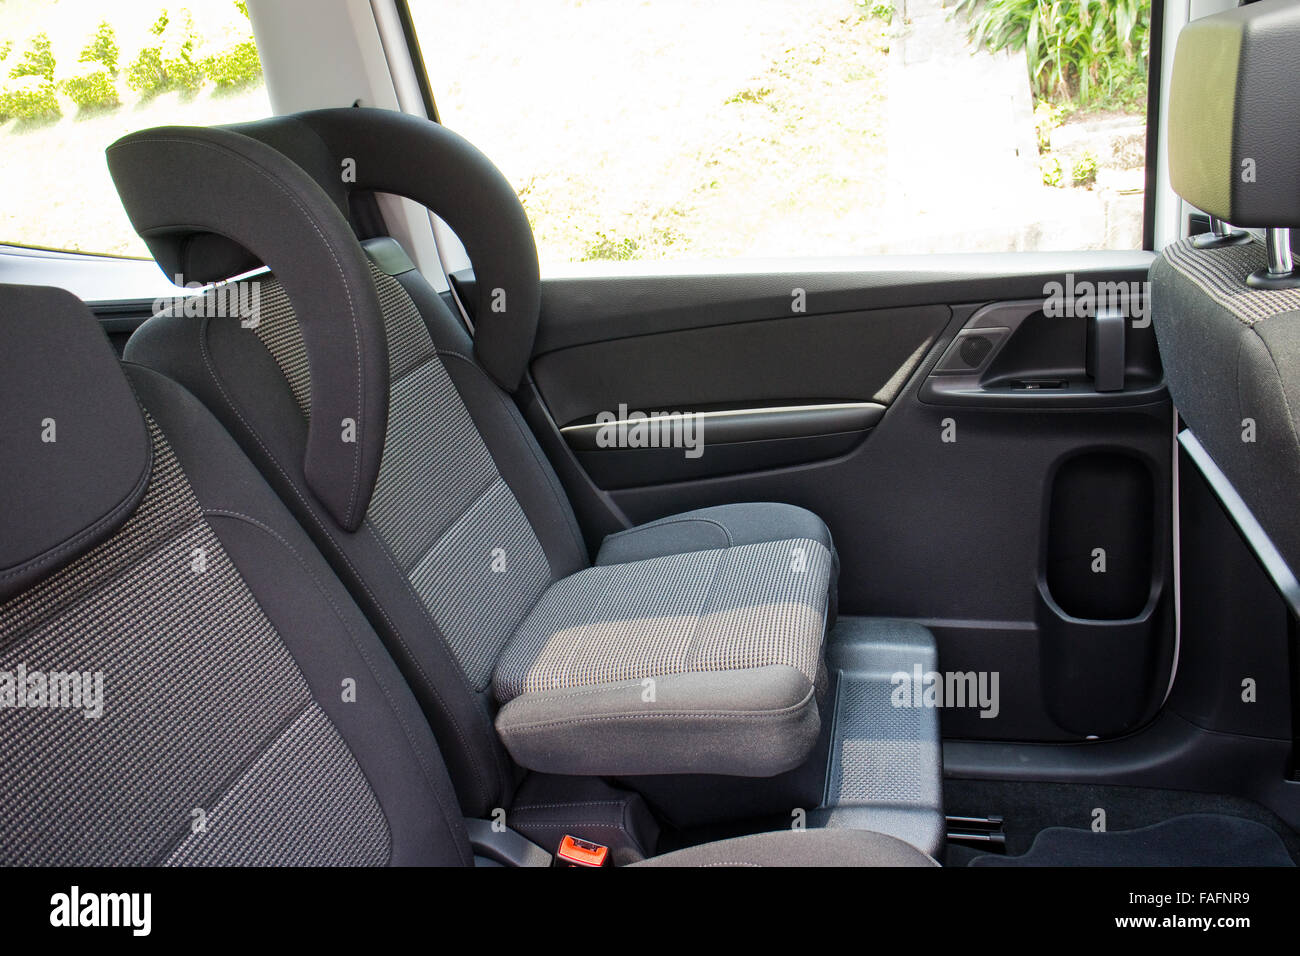 Baby Seat Car Test